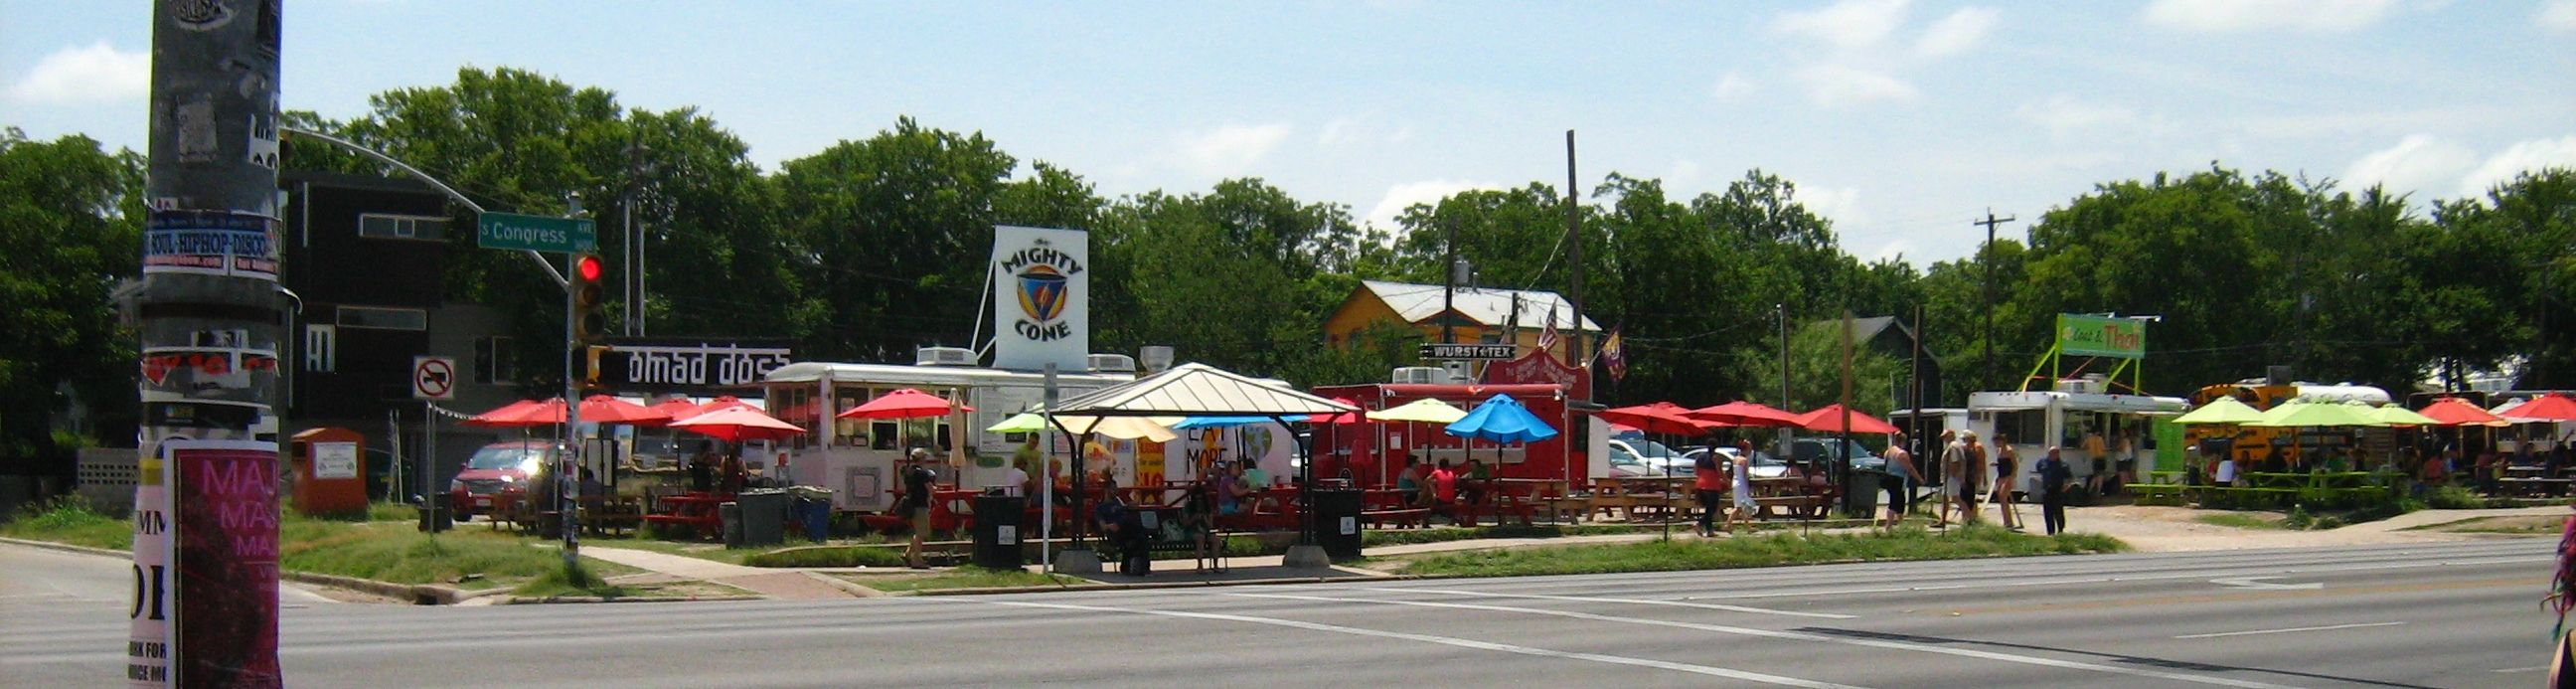 Austin Food Truck Park Across From Austin Cafe On Congressaustin